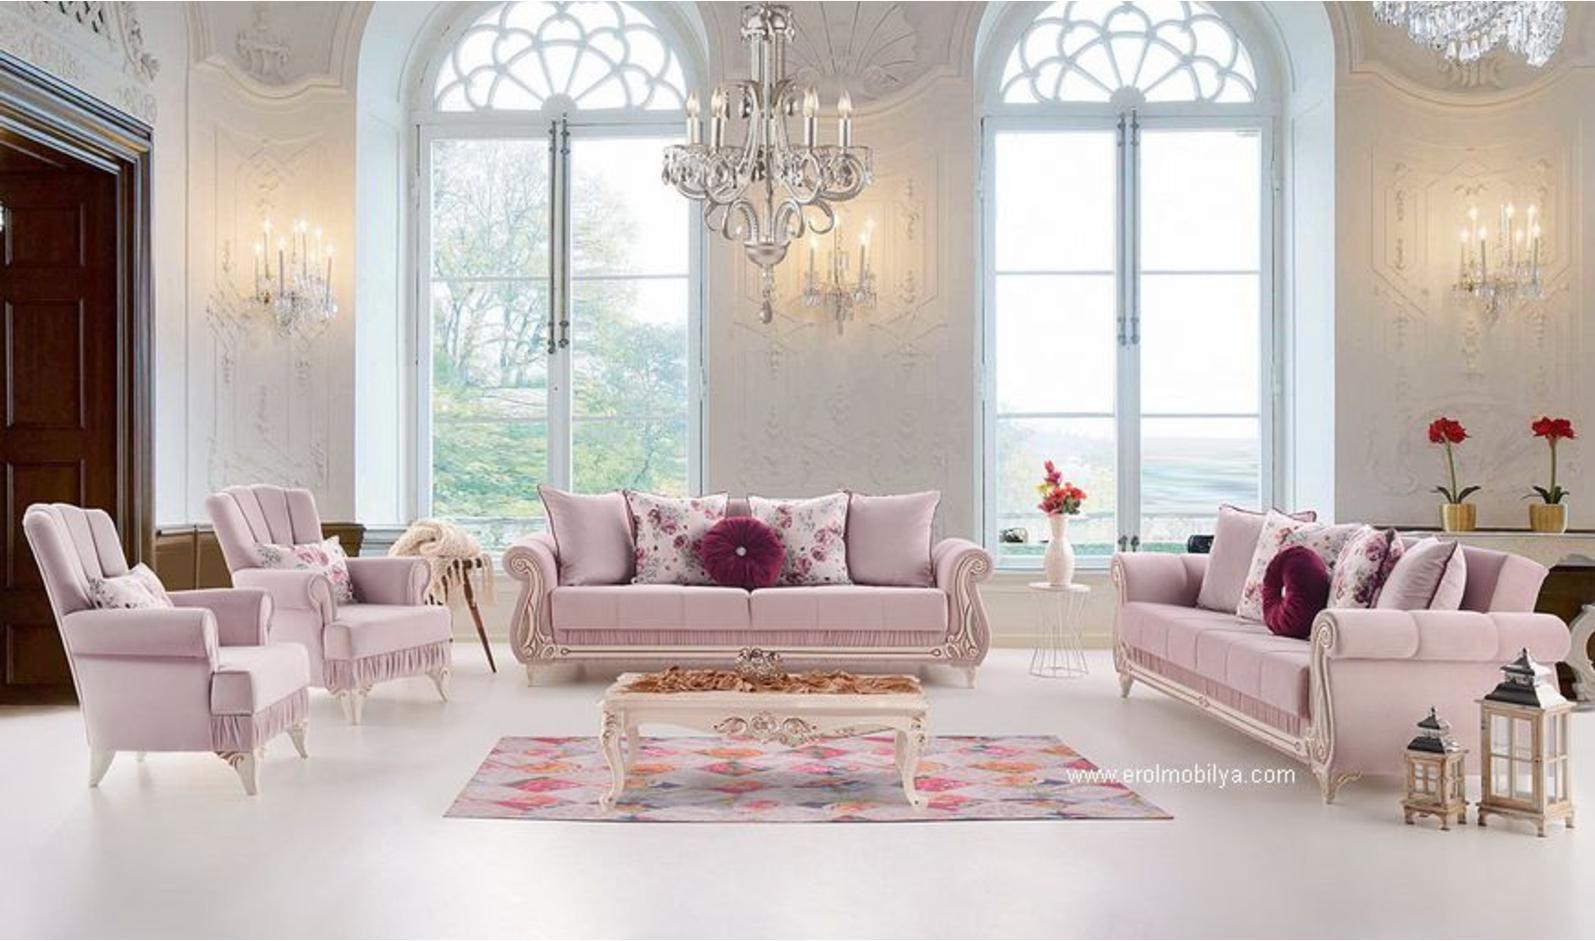 Manisa Kirkagac Spotcu 0544 349 19 12 Kirkagac Spot Eski Ikinci El Esya Alim Satimi Interior Design Interior Home